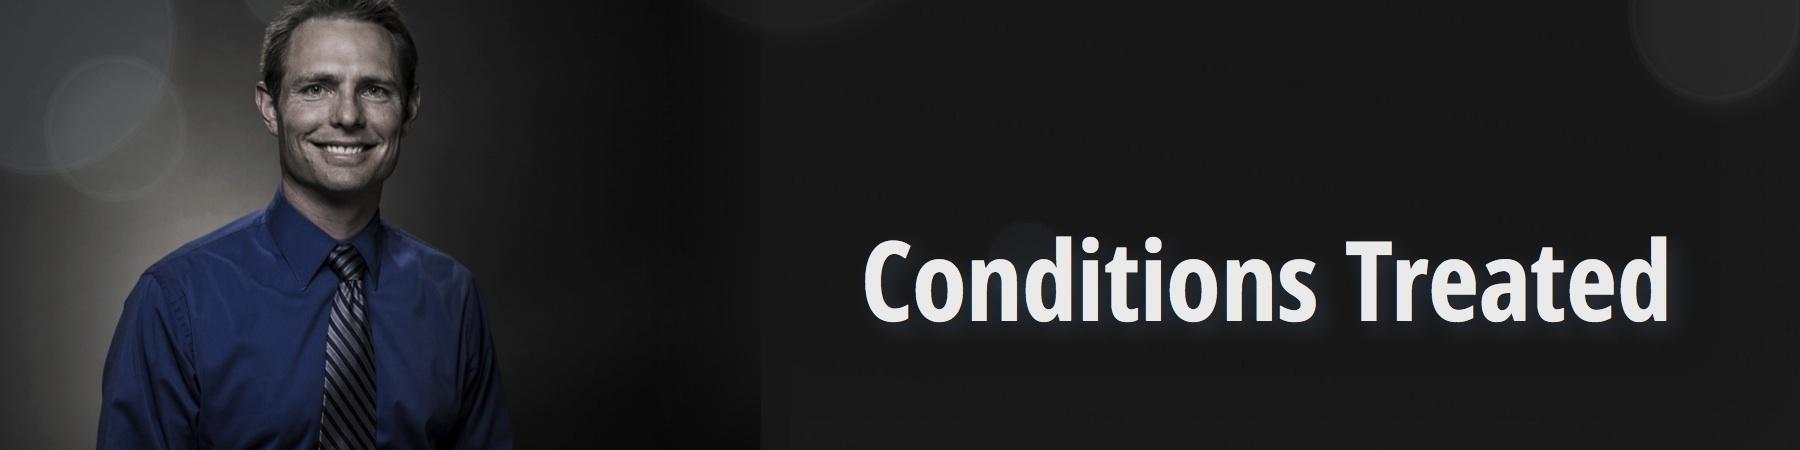 Ryan - Conditions Treated.jpg